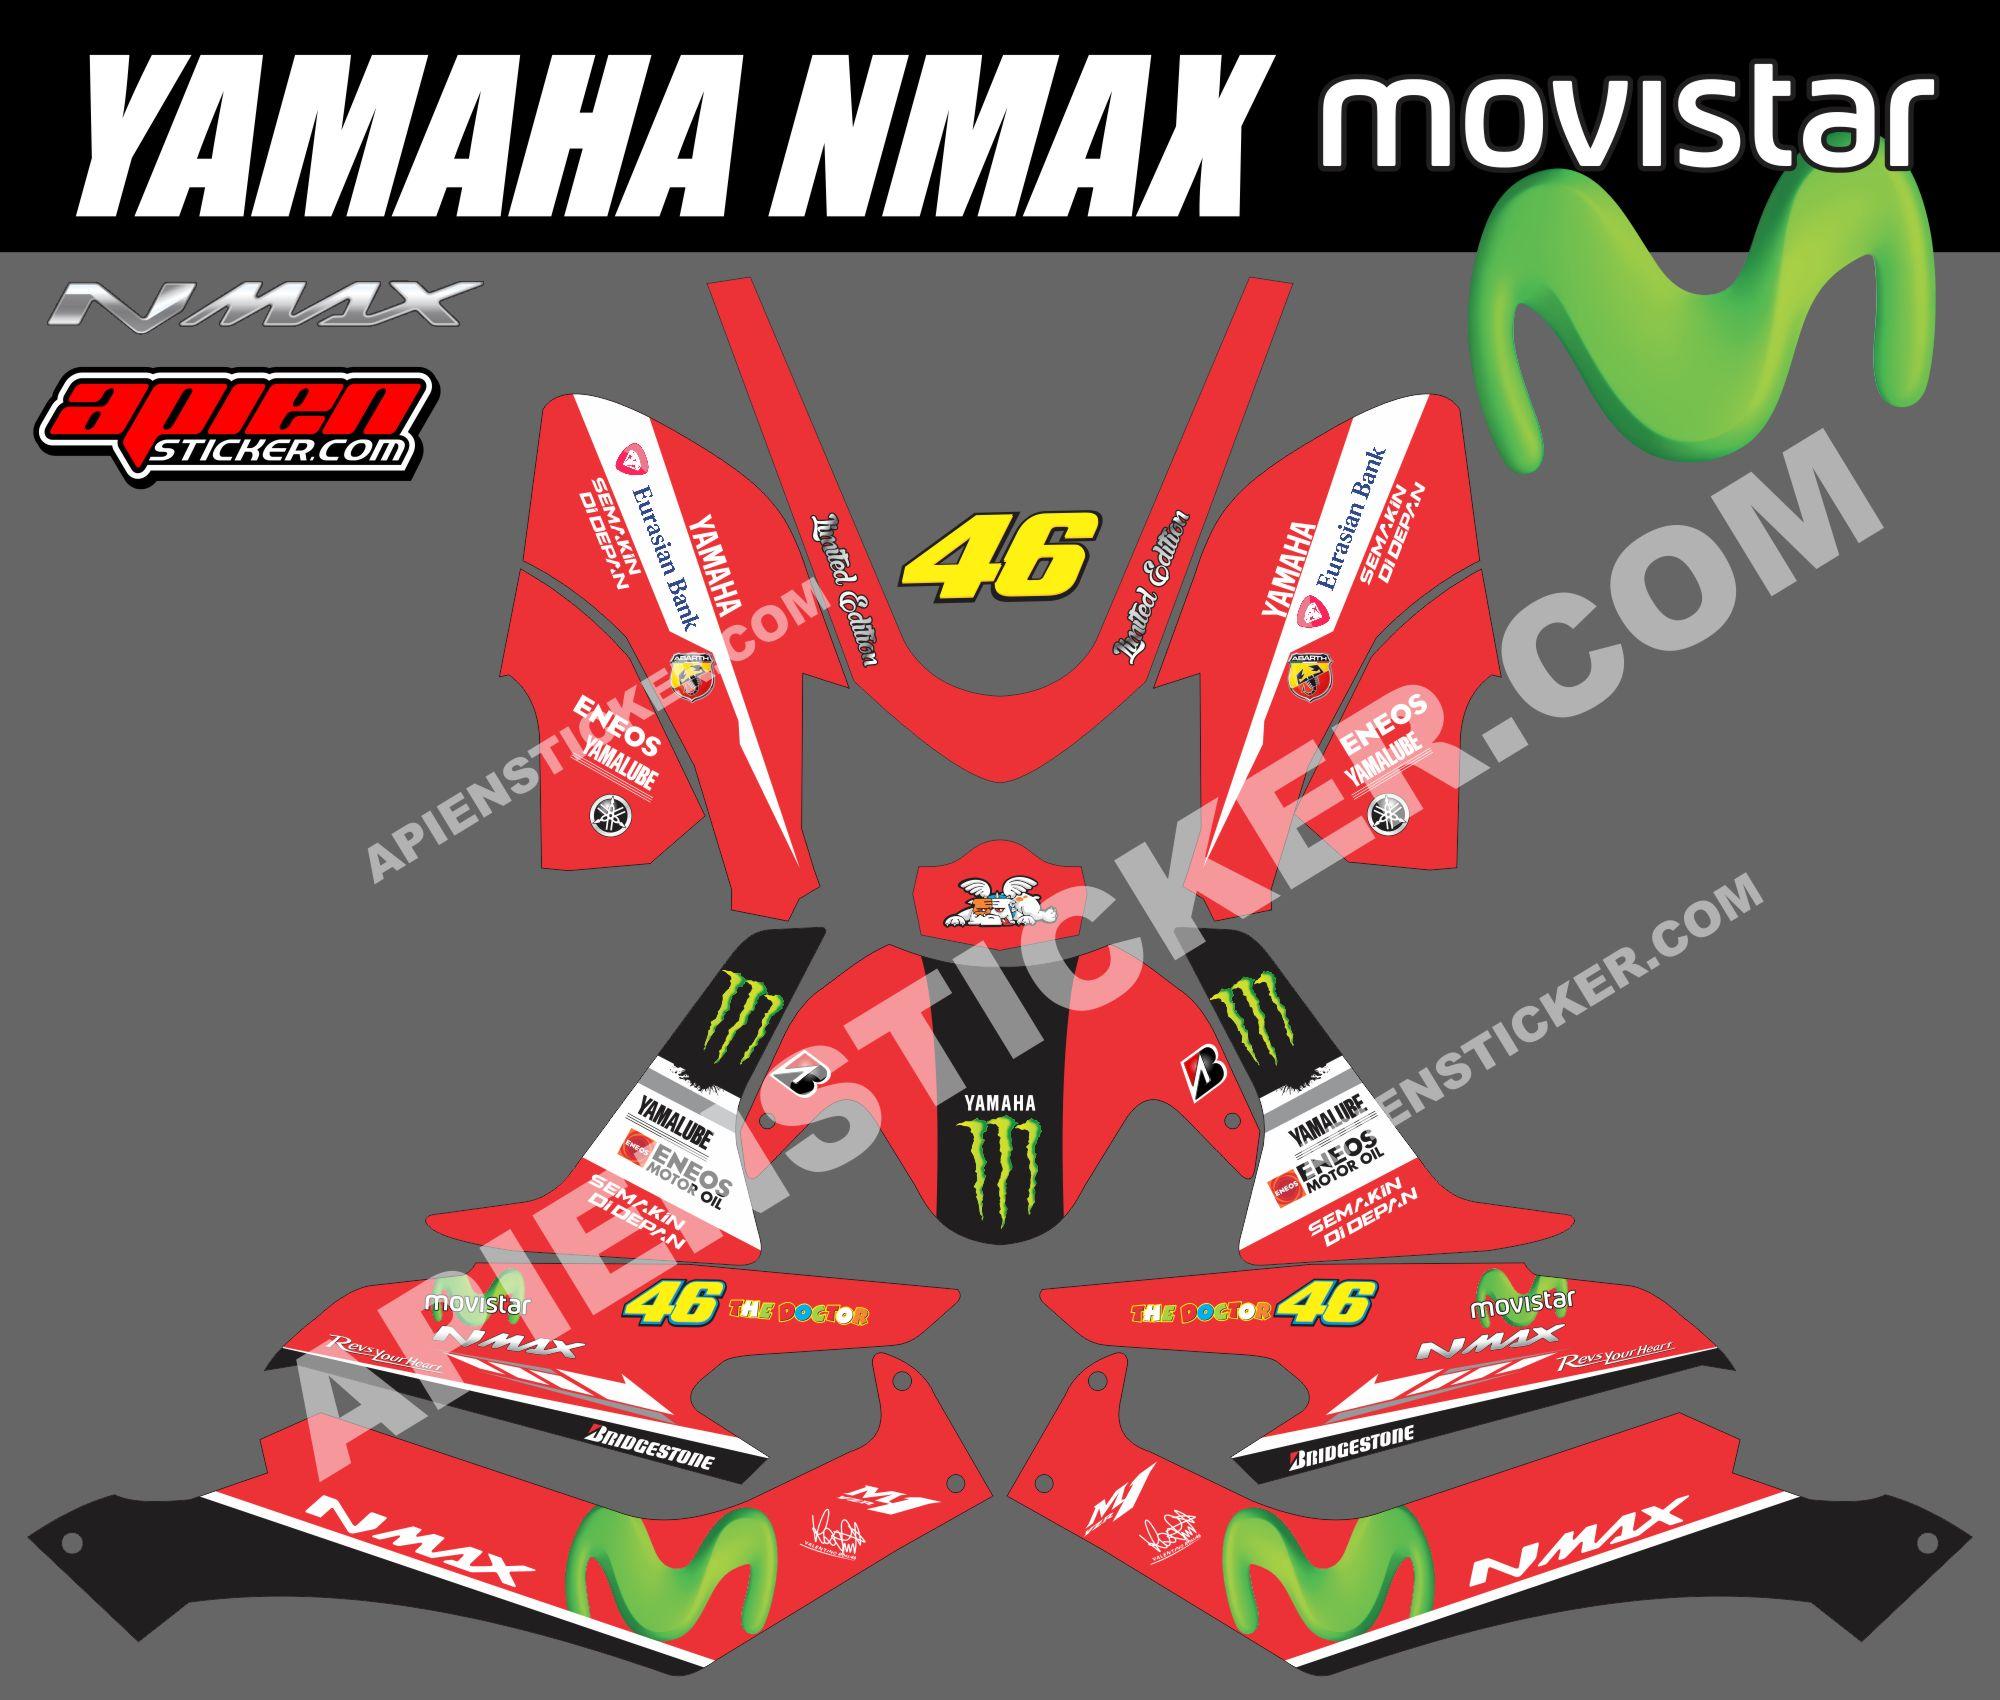 Striping Motor Yamaha NMAX Movistar Merah Apien Sticker - Mio decalsmodifikasi striping mio j striping stickers decals joehansb